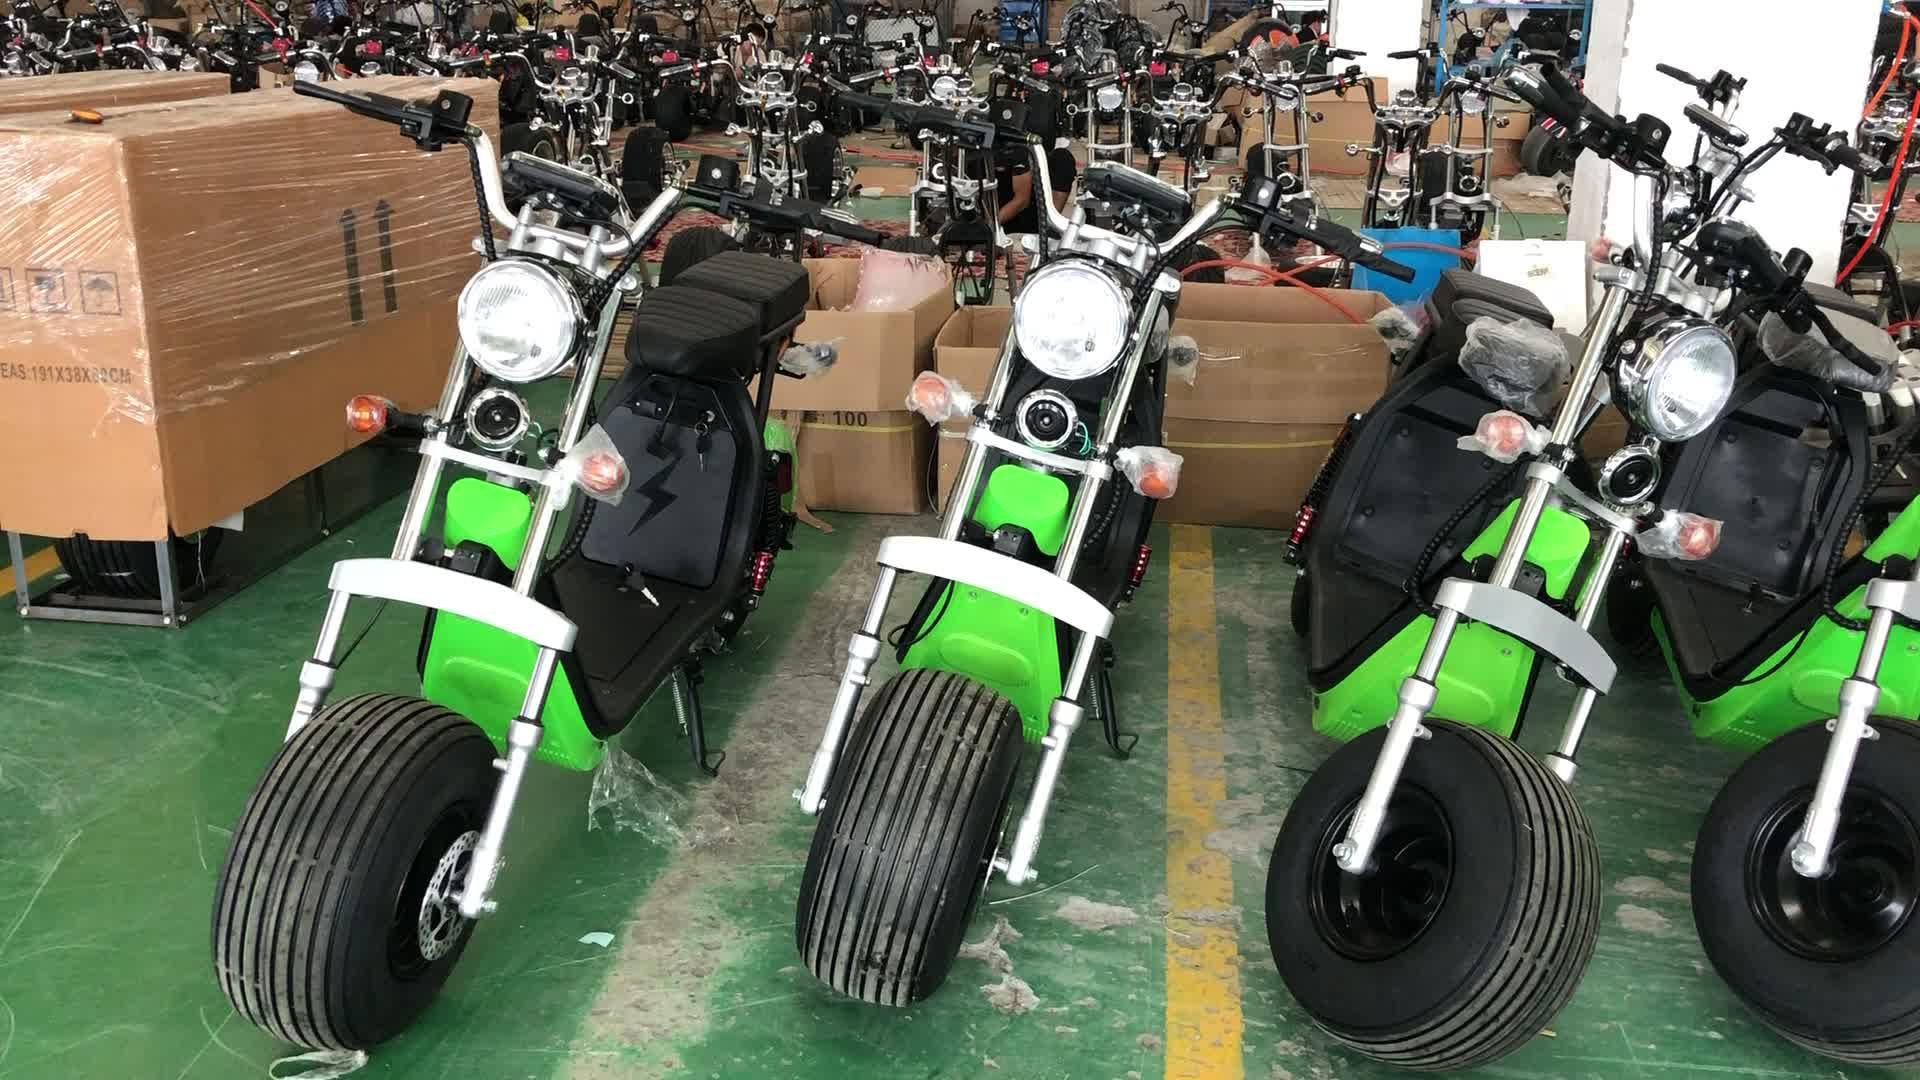 Eec coc toda fat tire citycoco e скутер электрический скутер Австралия